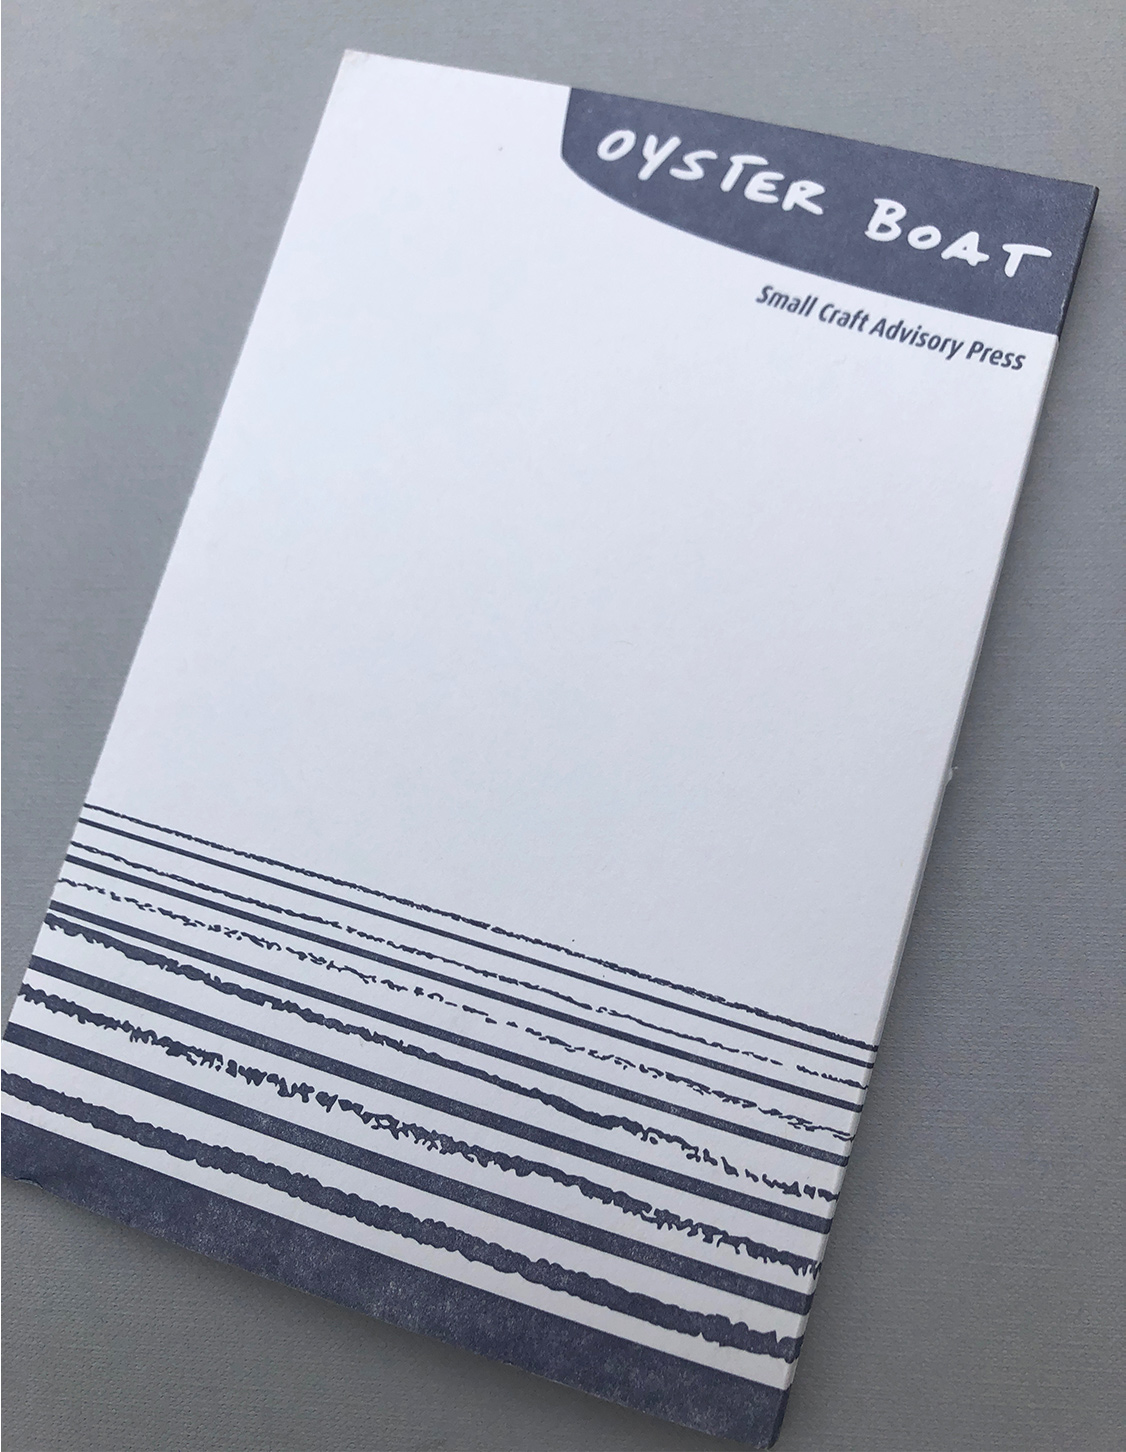 https://lisabulawsky.com/wp-content/uploads/2020/01/TaxonomyoftheMark_OysterBoat_backcover.jpg